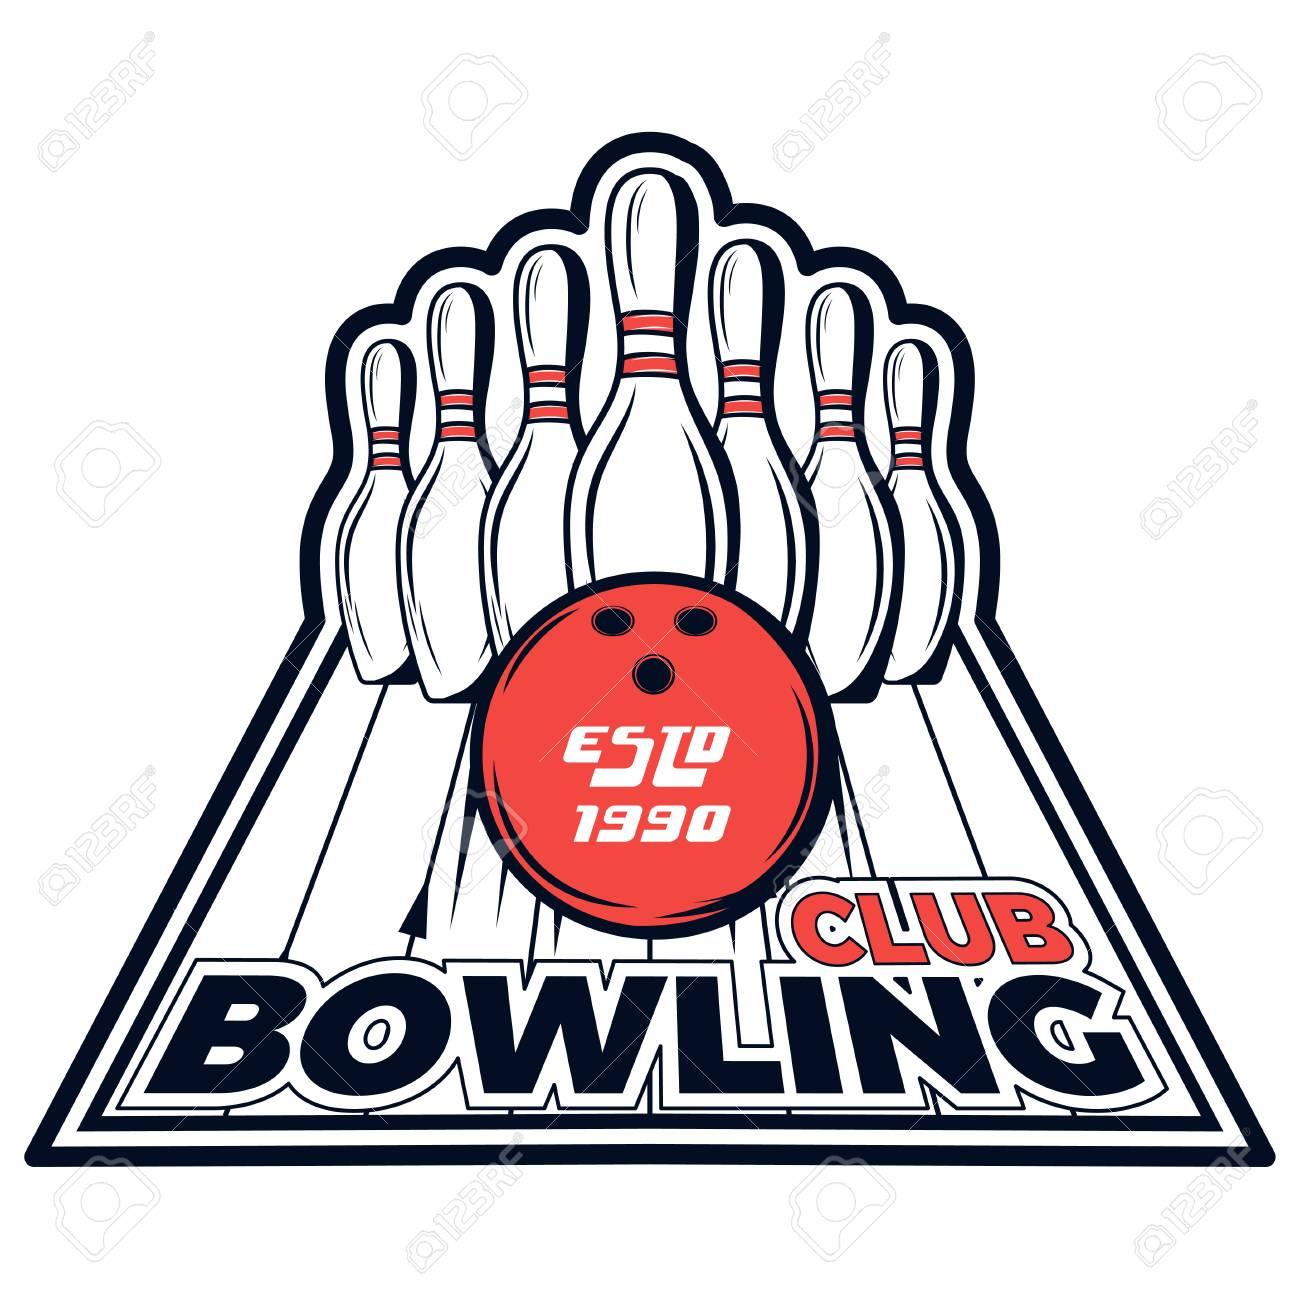 vector bowling club logo for print design internet on white rh 123rf com bowling logopedia bowling logos for shirts